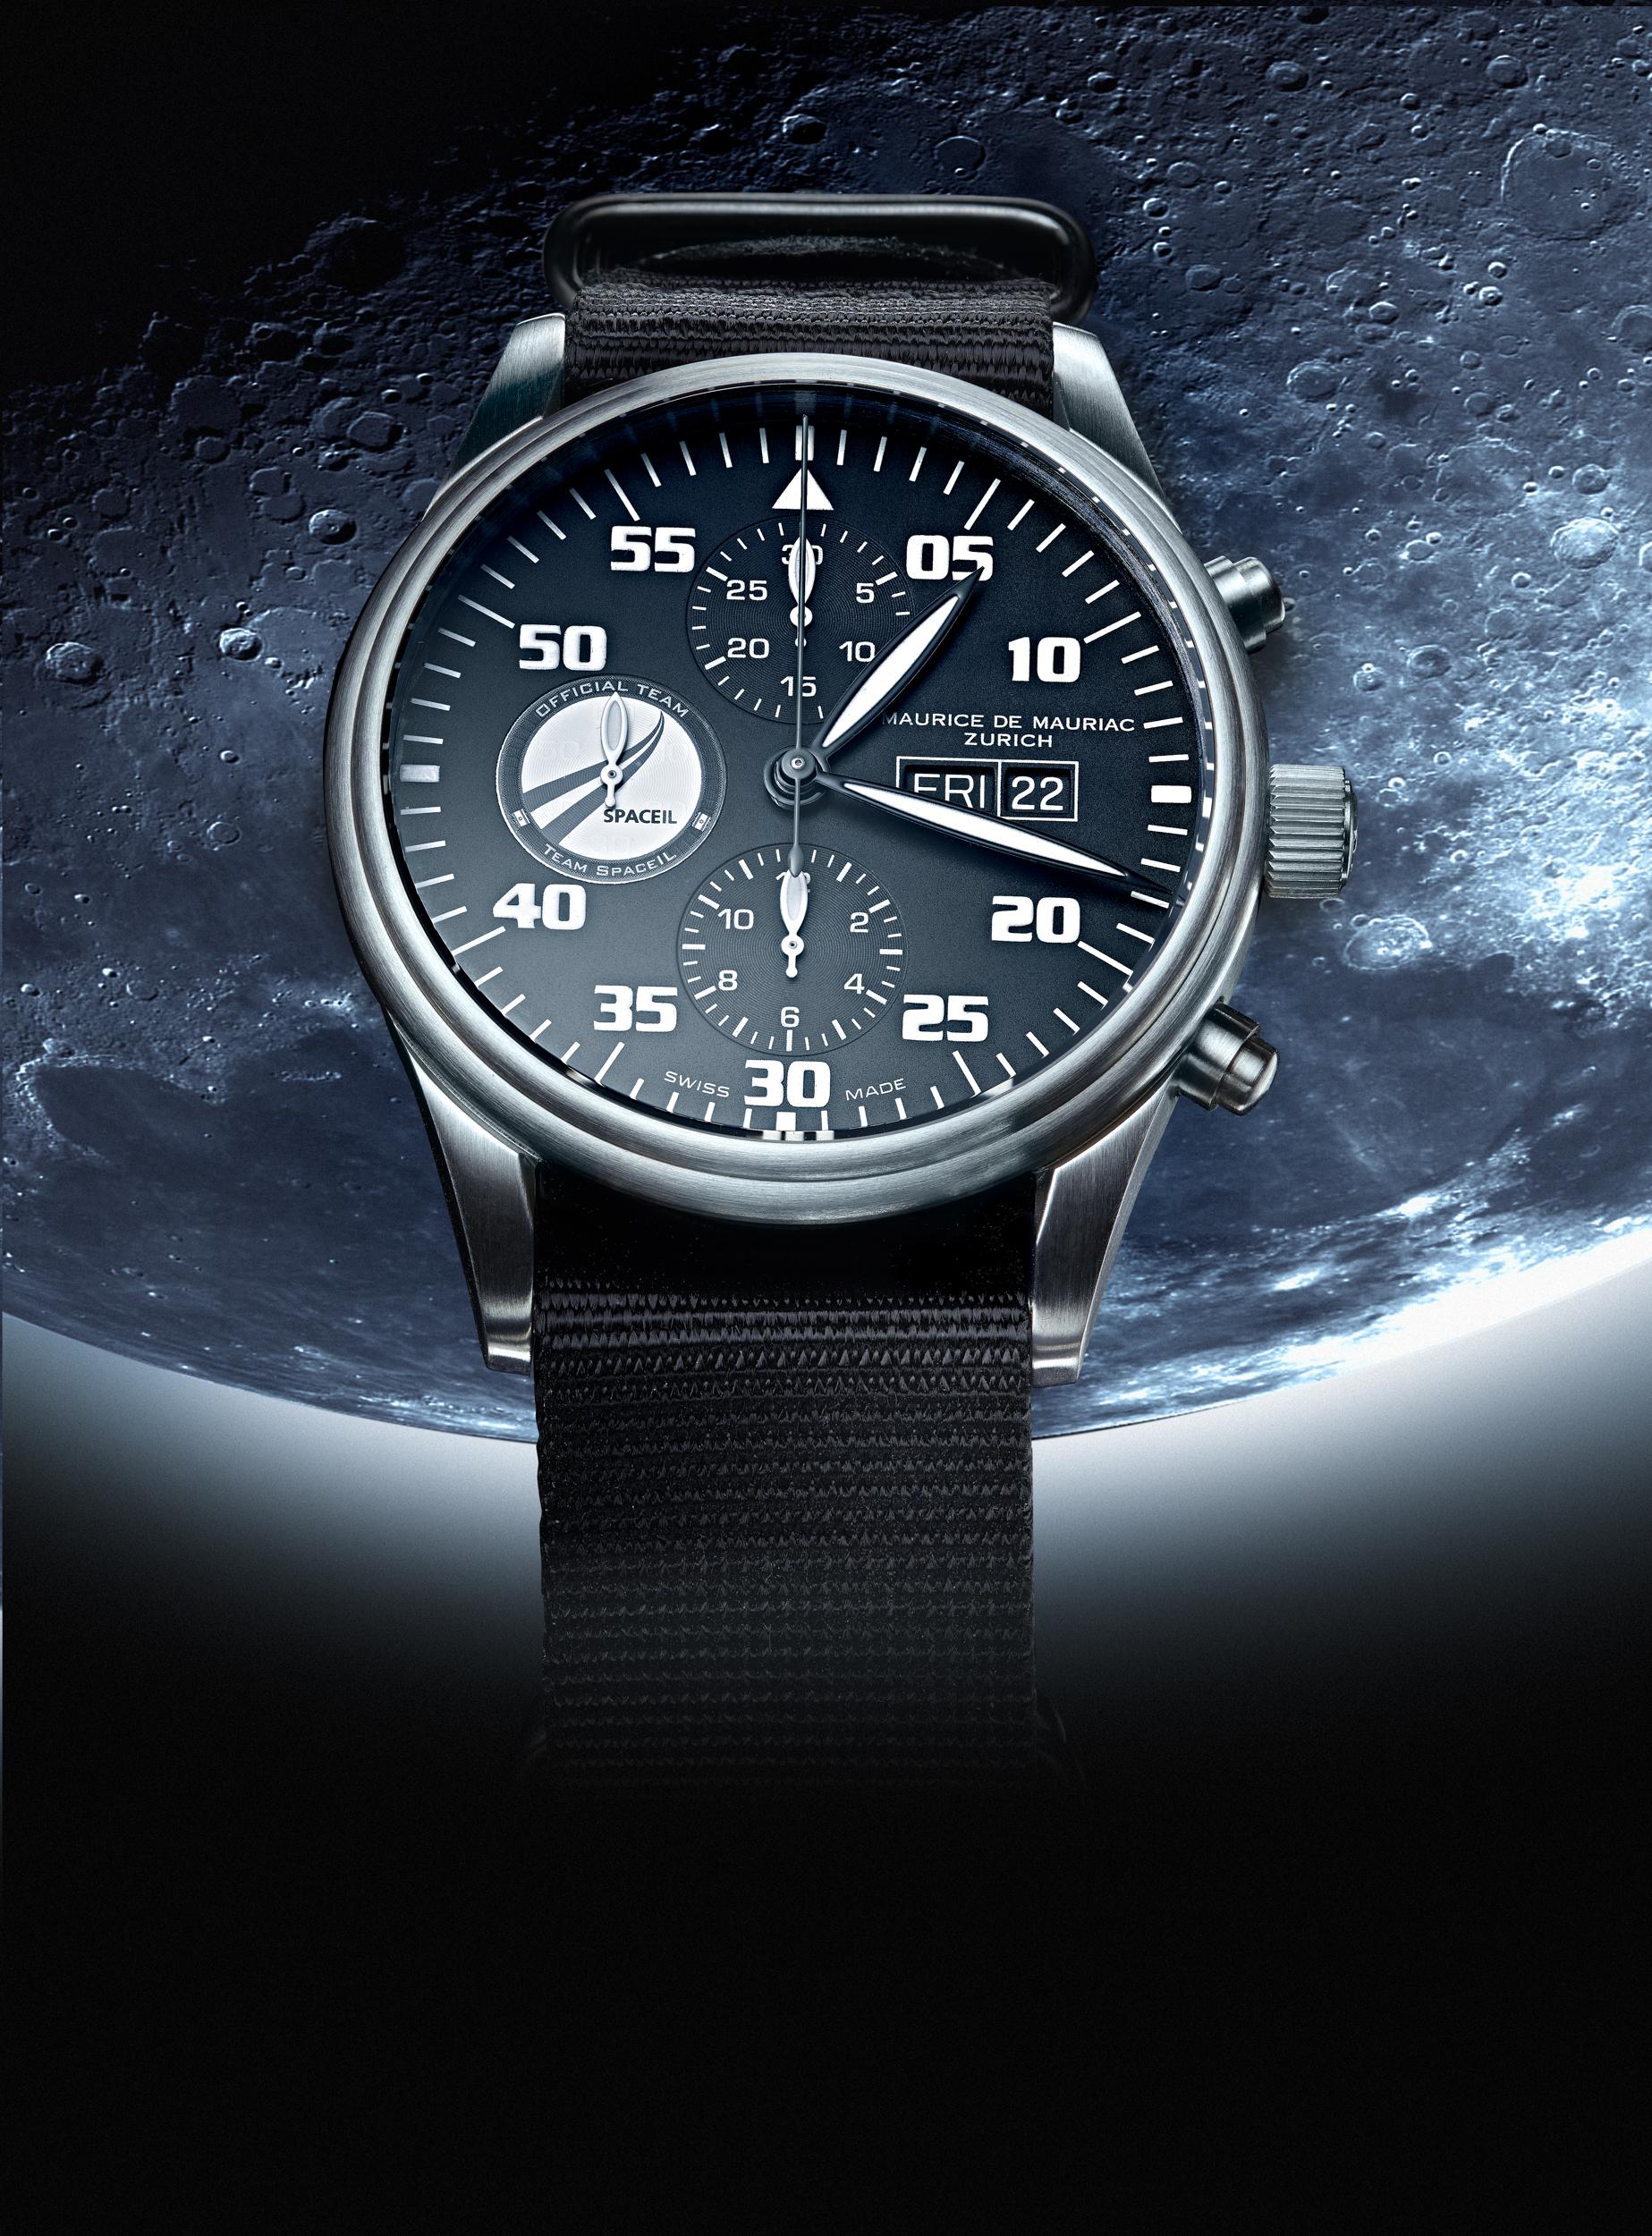 Moonwatch Maurice de Mauriac, Uhrenfotografie, Zürich, Schweiz